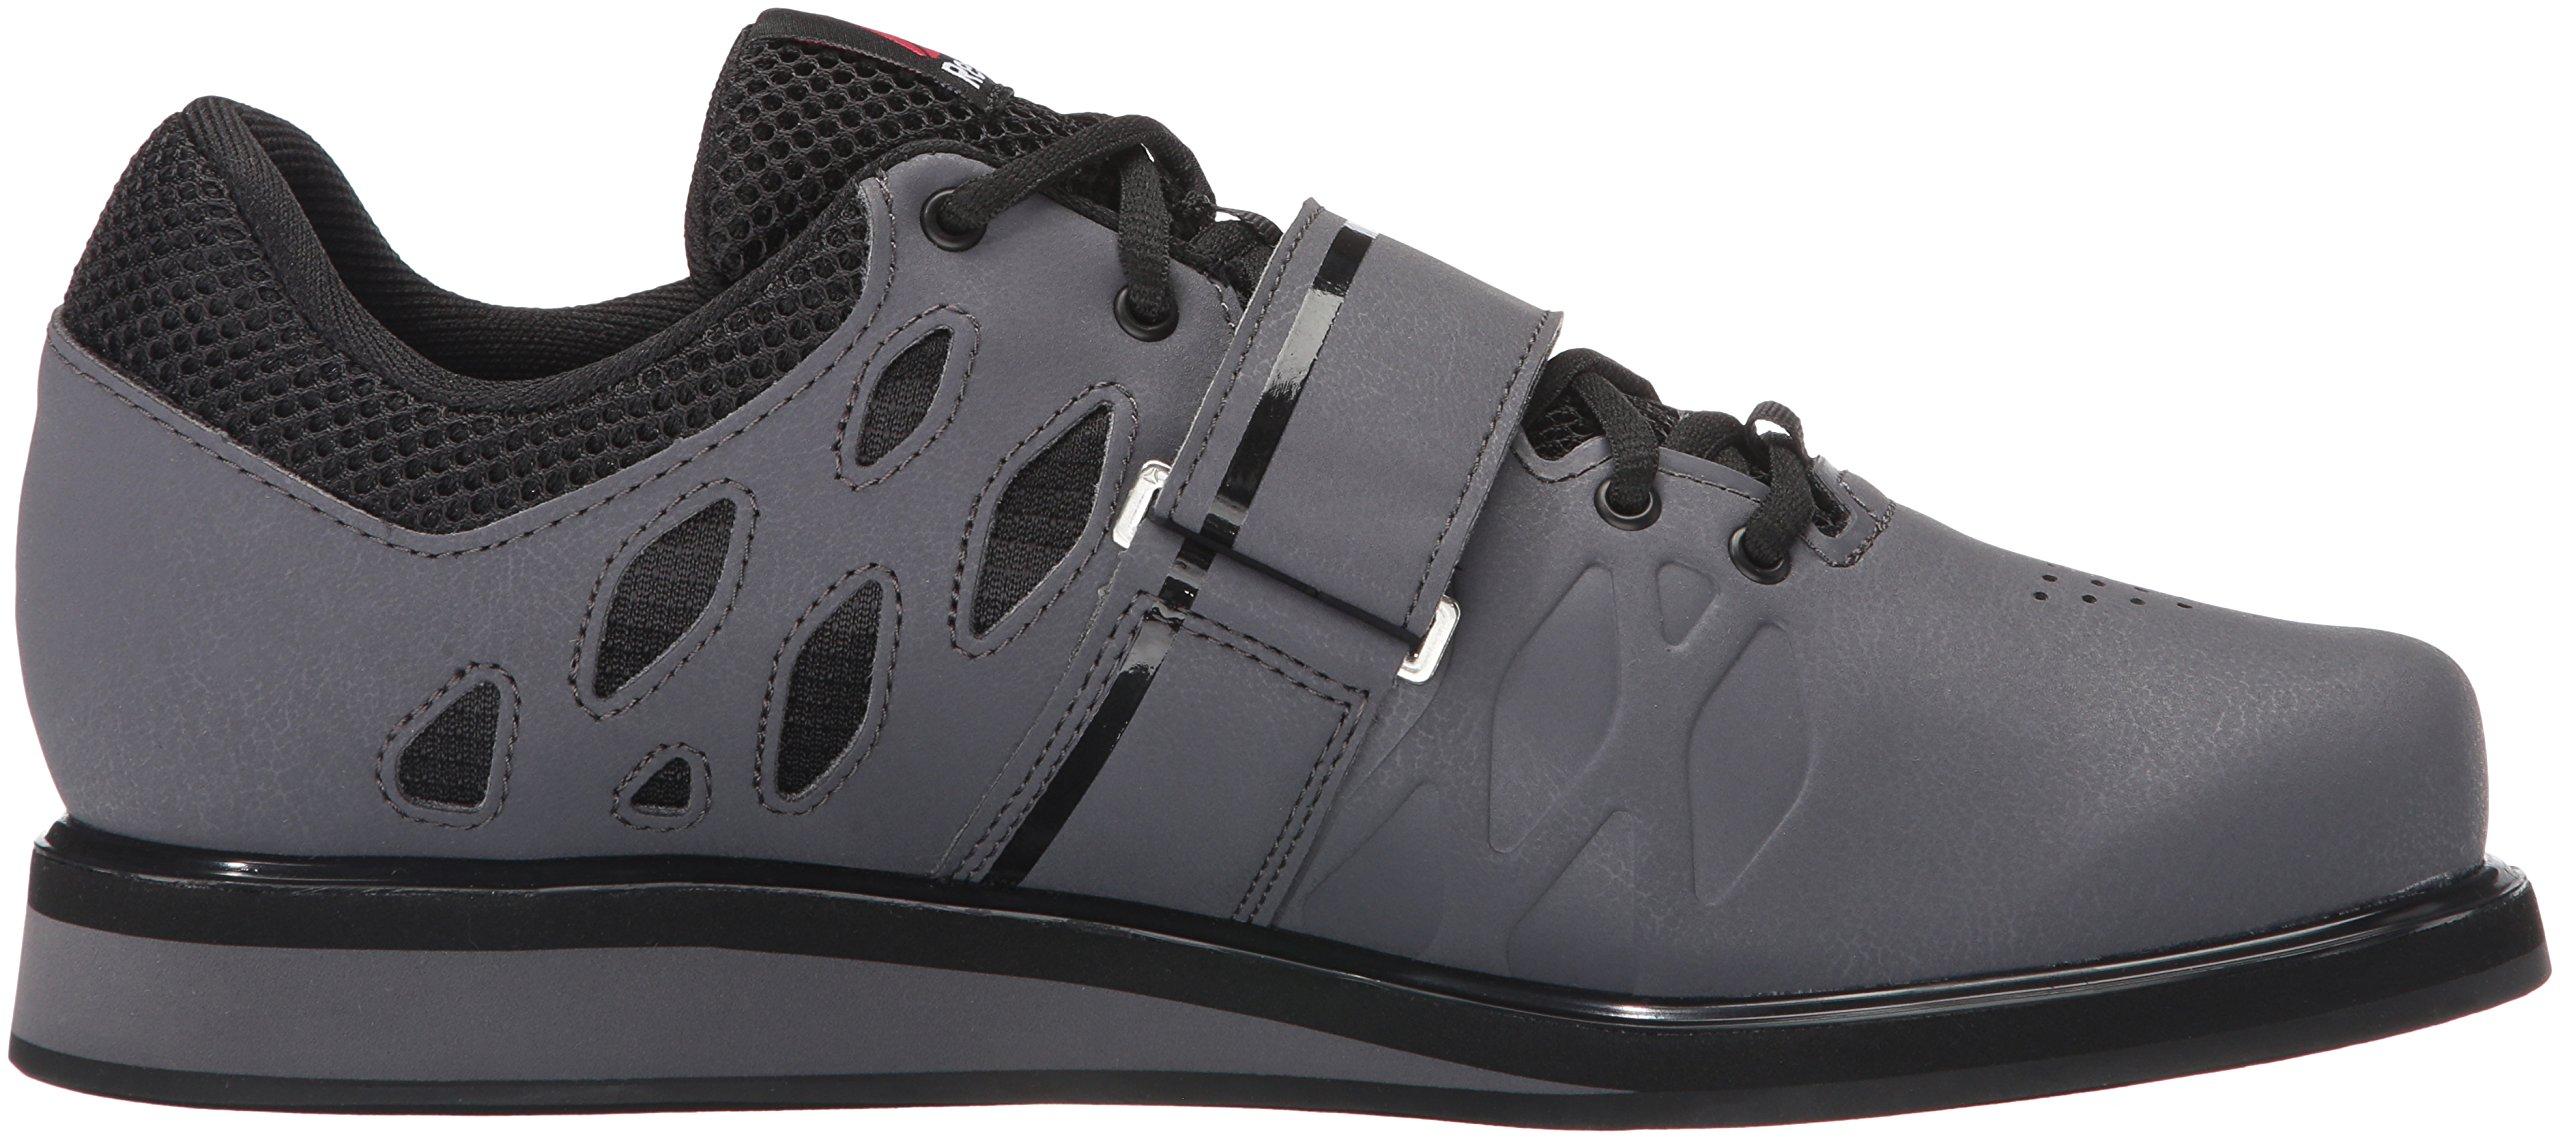 Reebok Men's Lifter Pr Cross-Trainer Shoe, Ash Grey/Black/White, 7 M US by Reebok (Image #12)